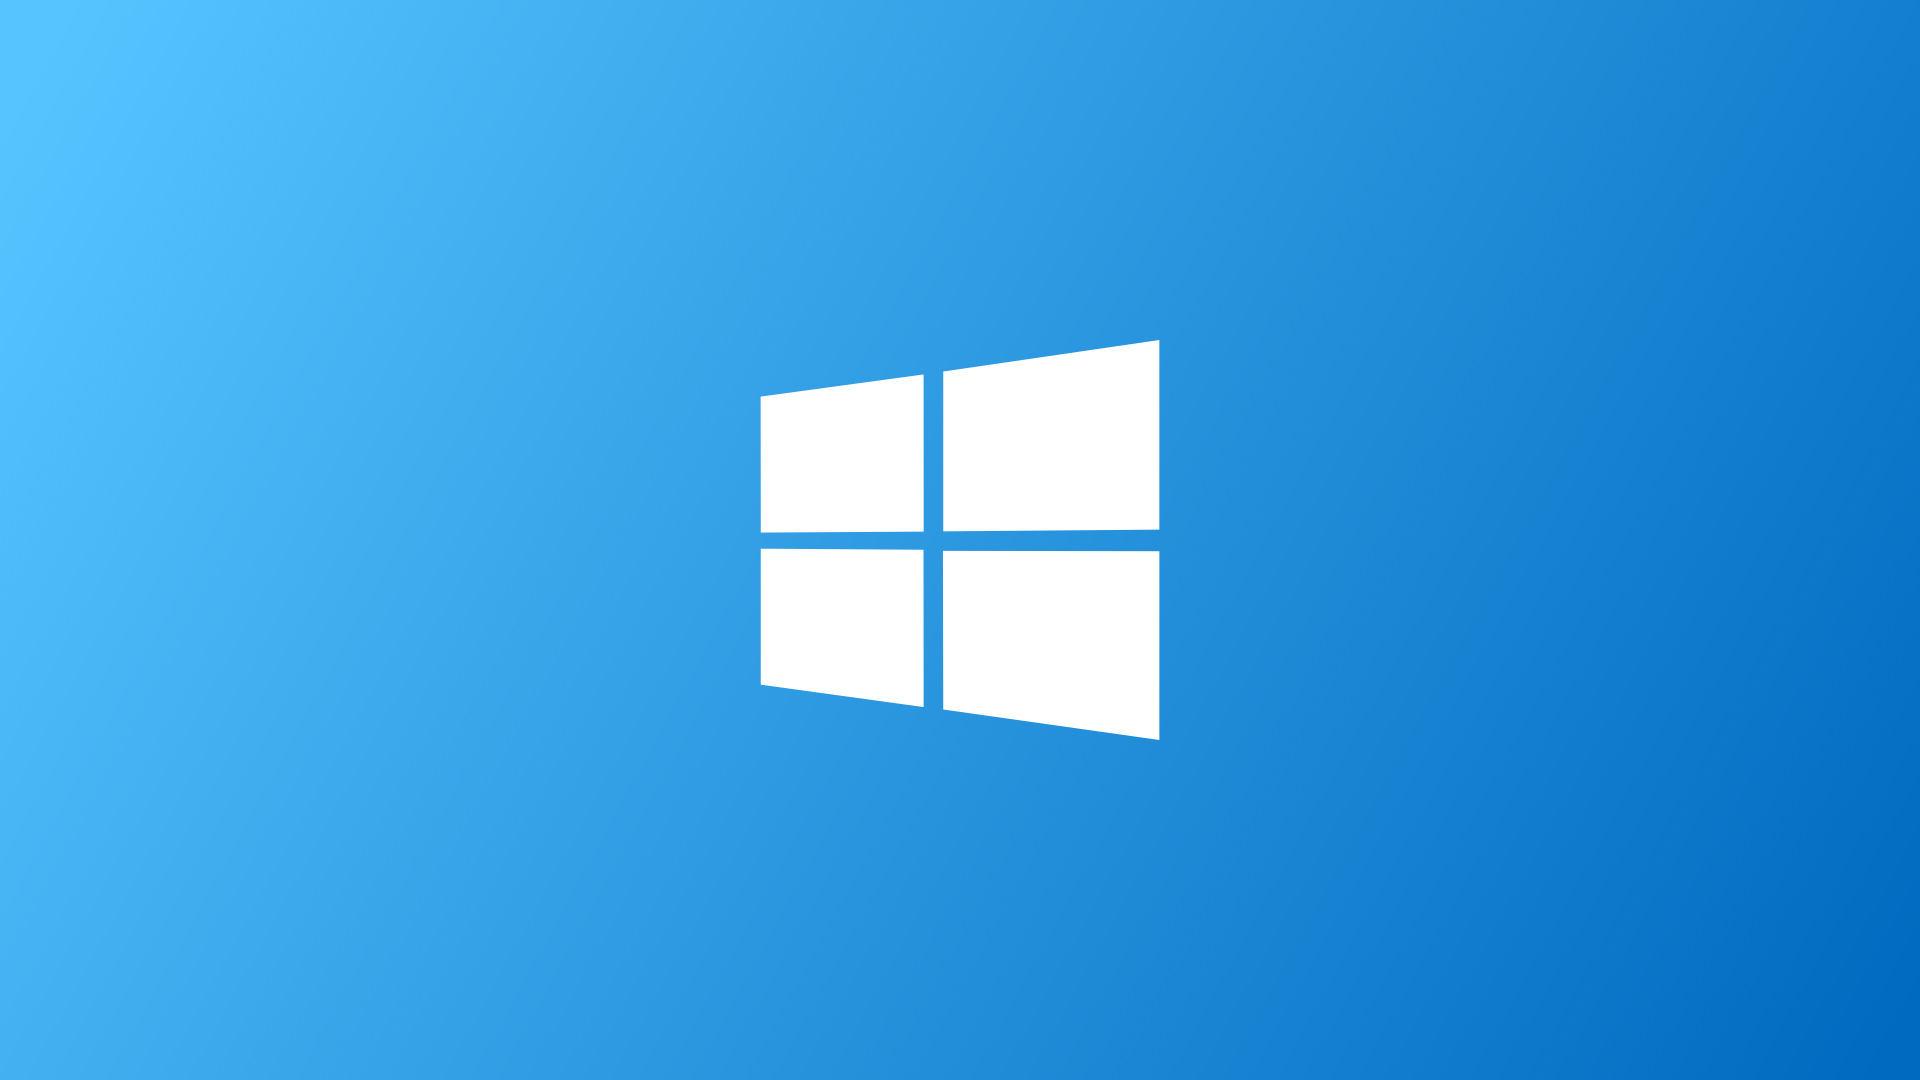 imagen de windows full hd